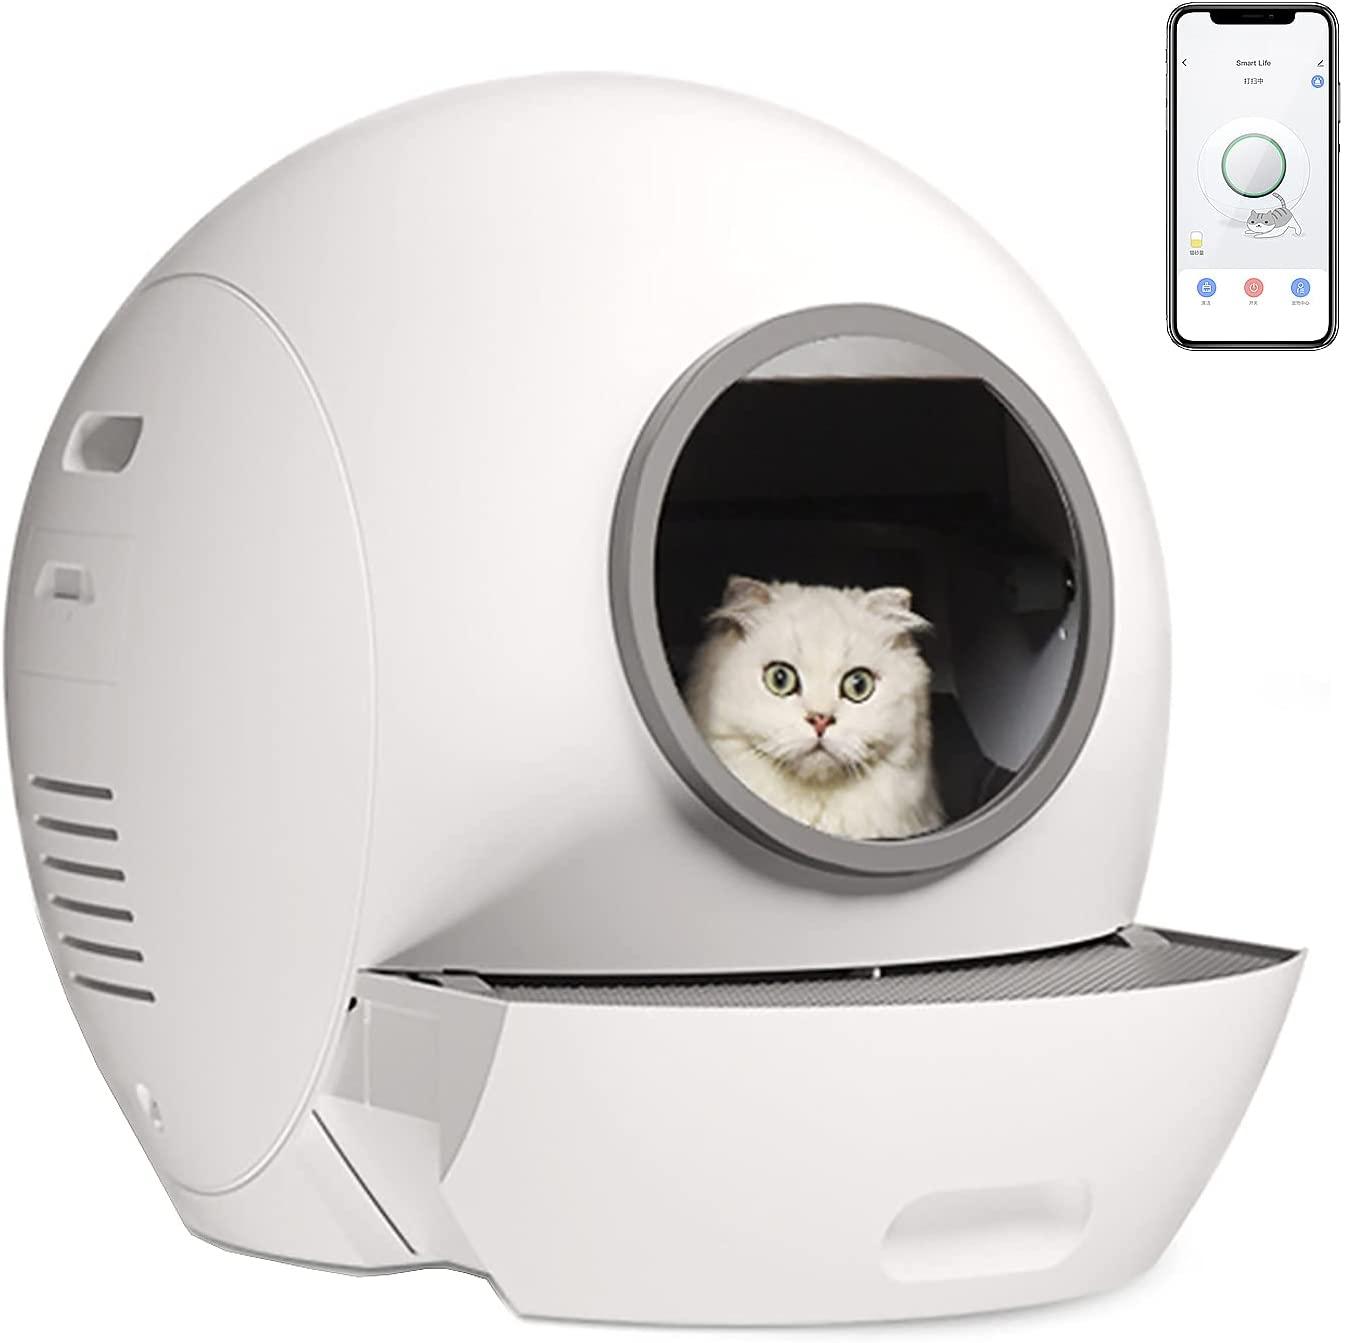 PURROMM automatisches Katzenklo